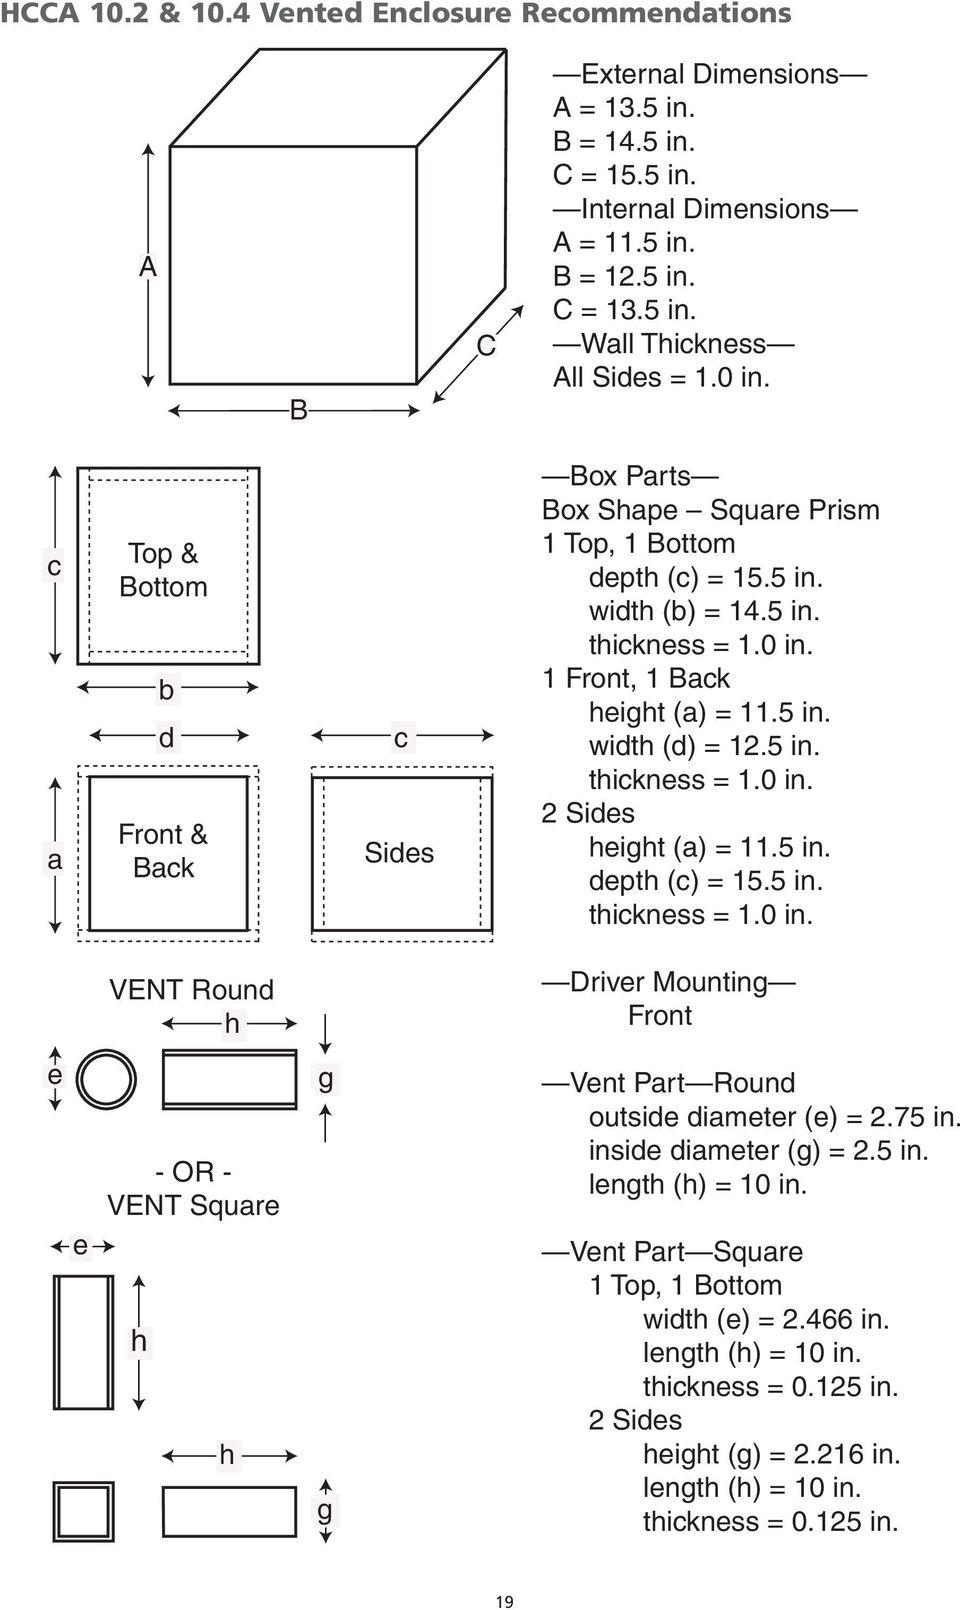 medium resolution of subwoofer hcca pdf orion hcca 15 wiring diagram